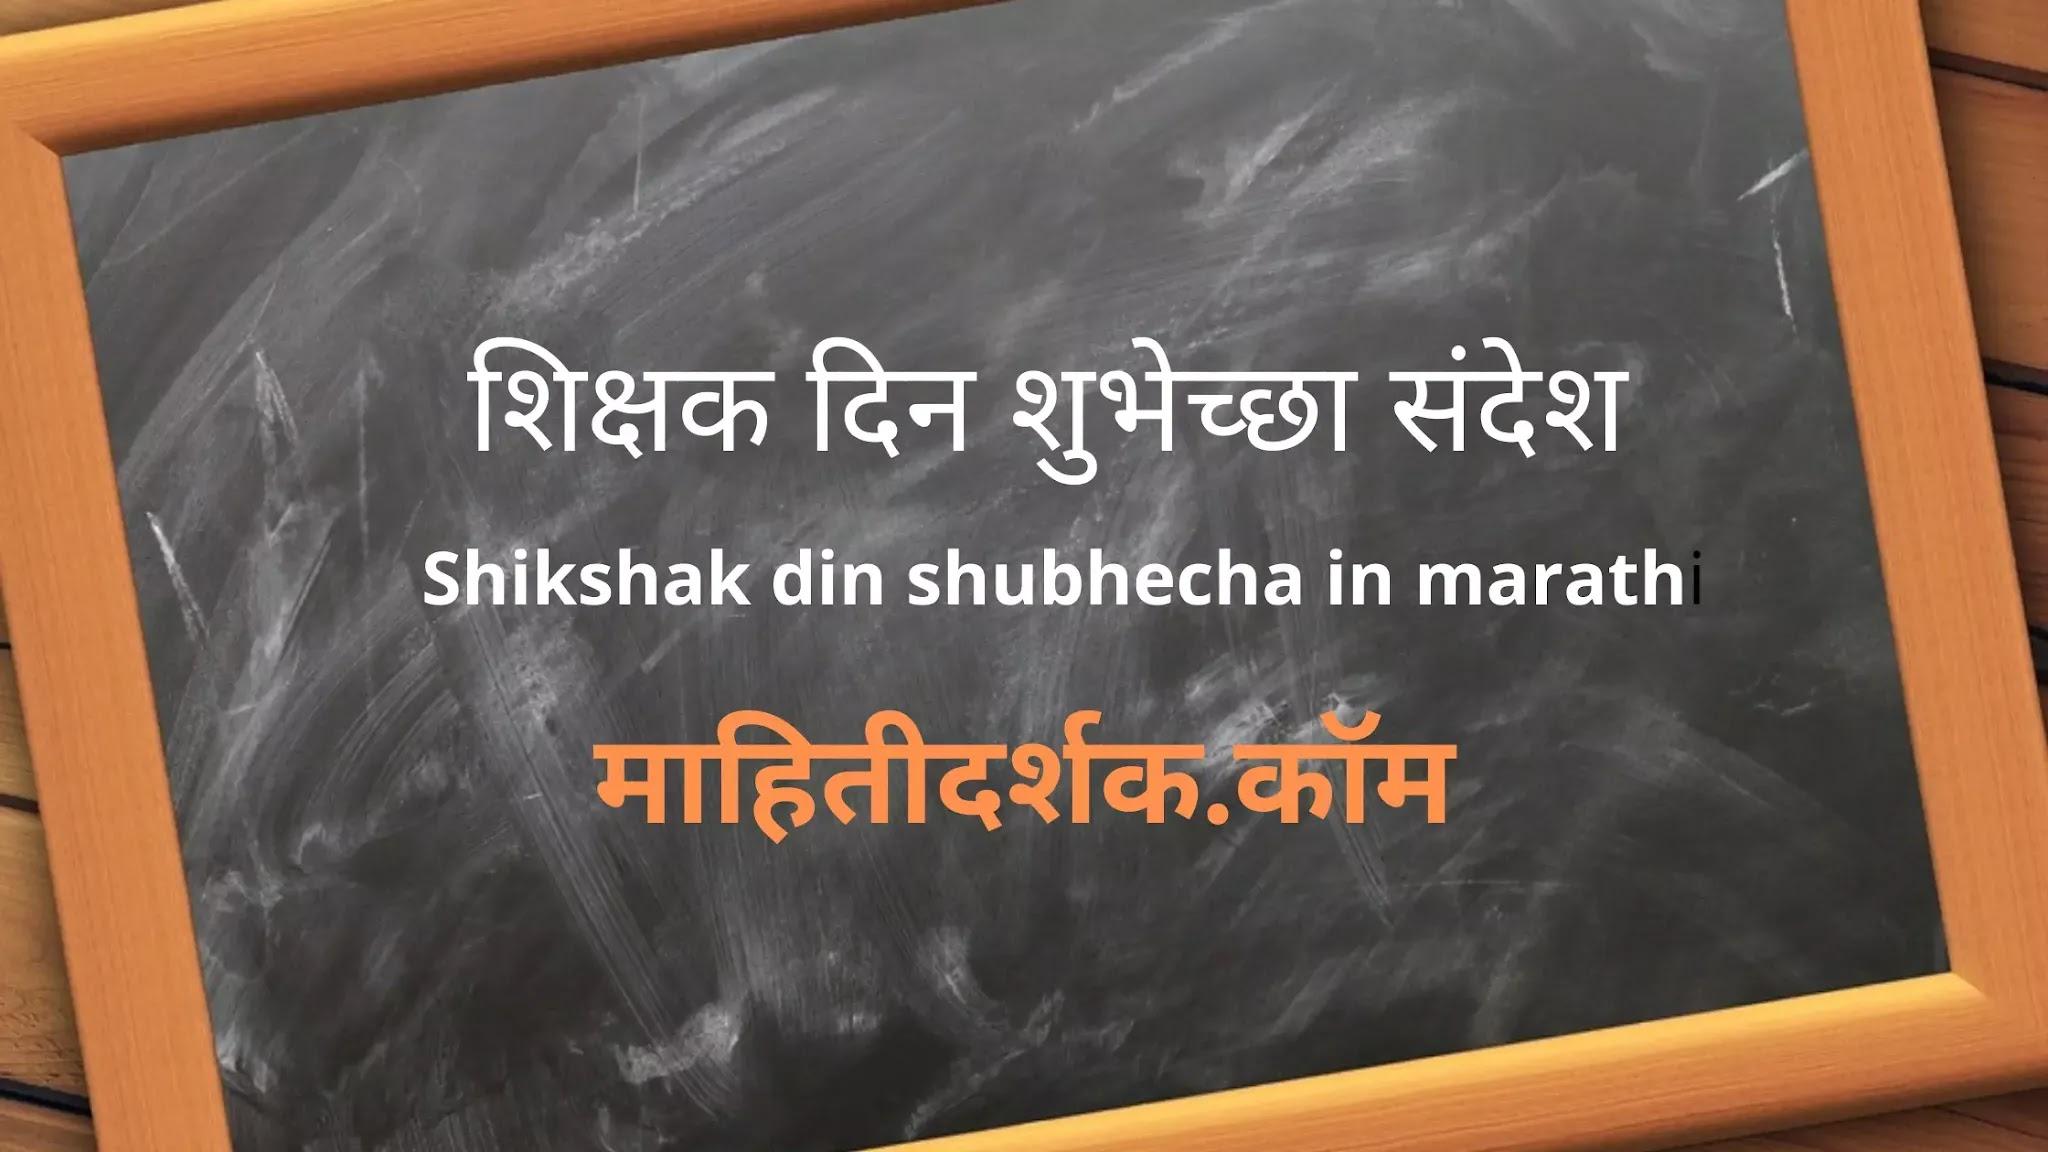 Shikshak din shubhecha in marathi